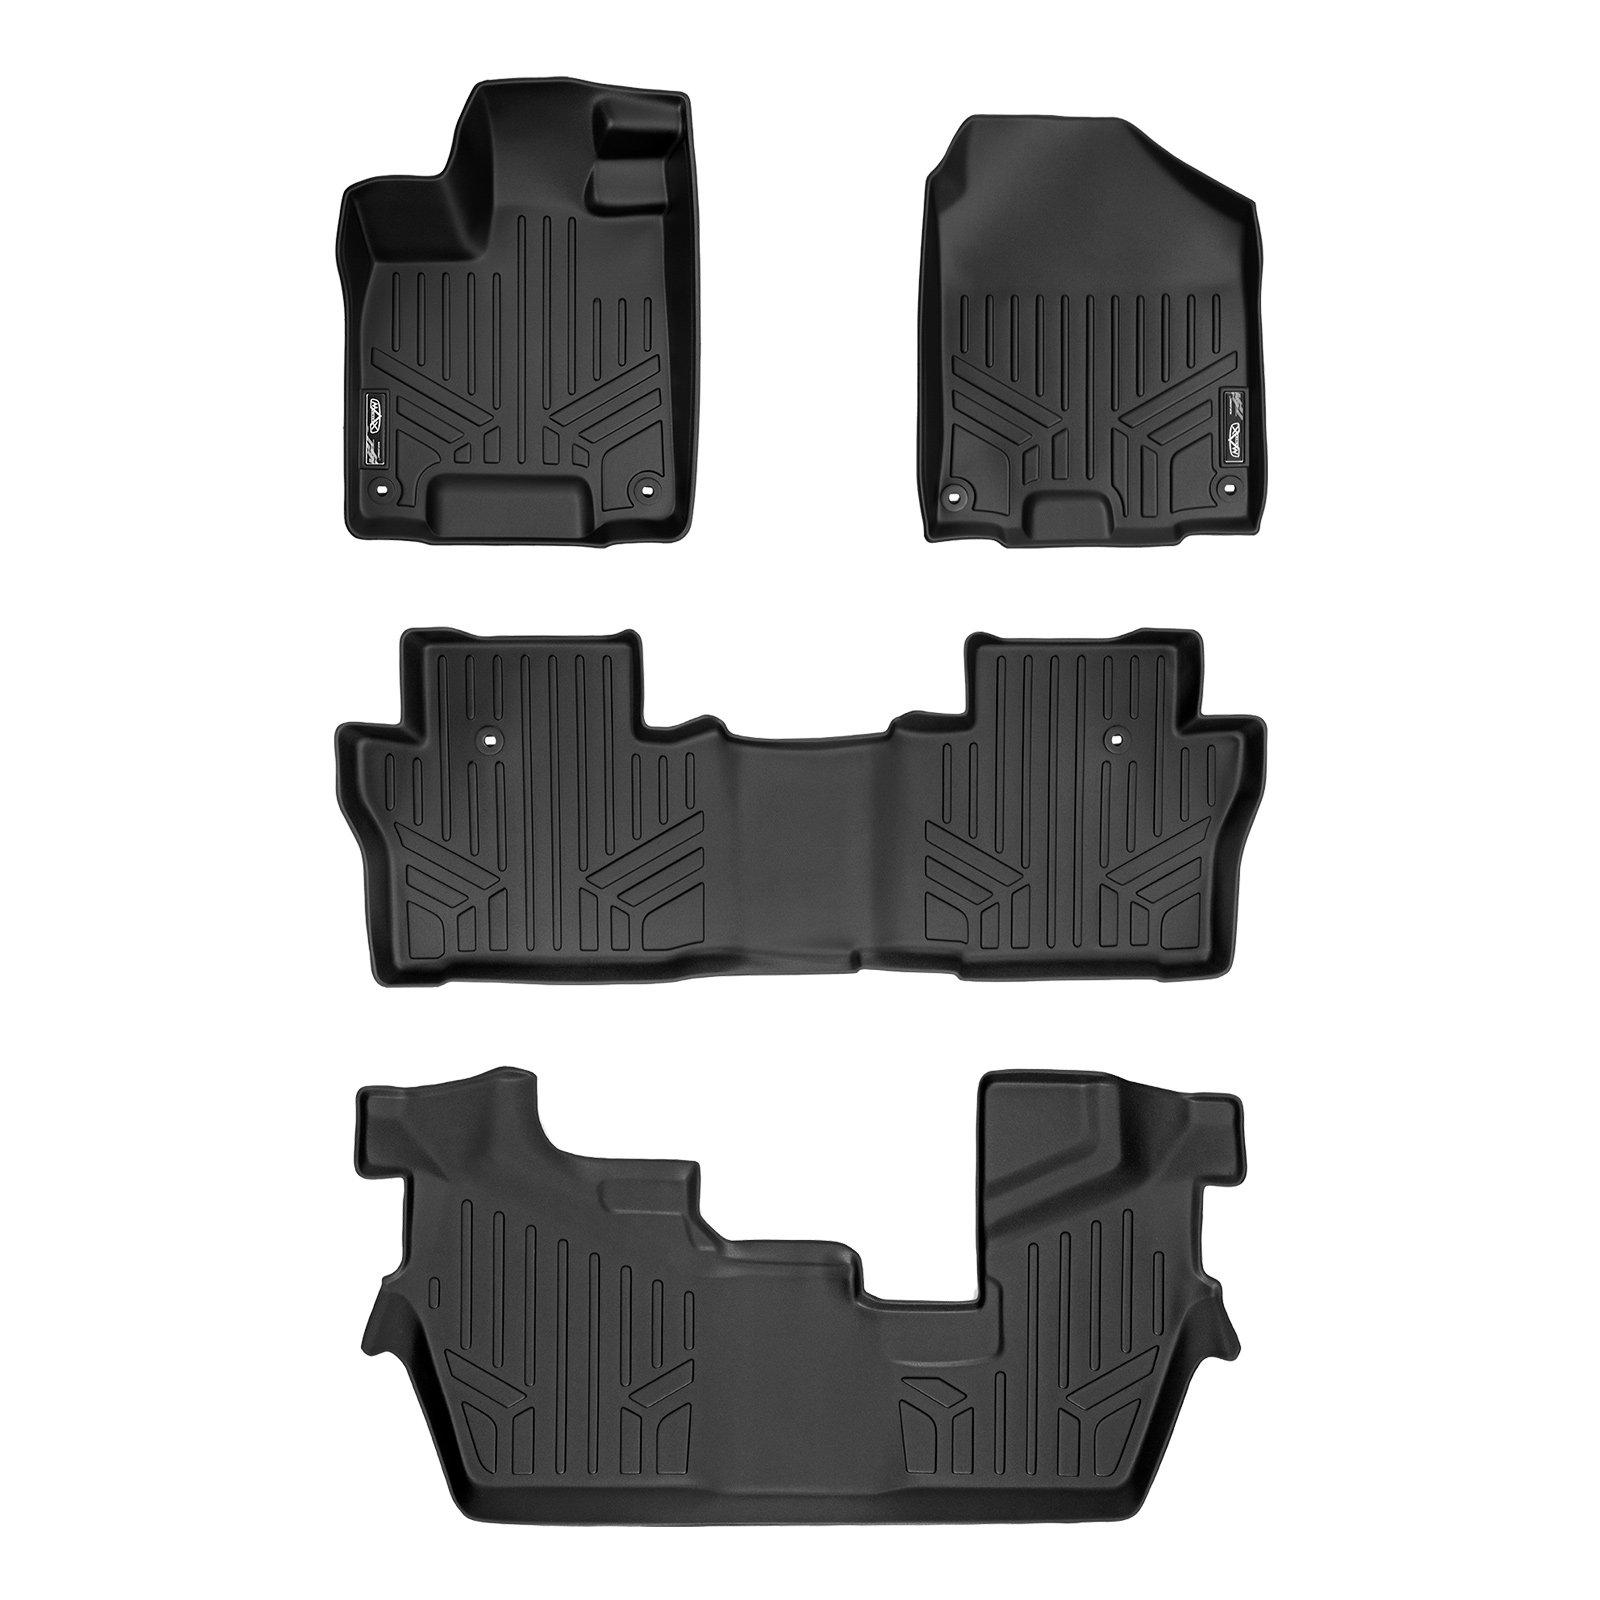 SMARTLINER Floor Mats 3 Row Liner Set Black for 2016-2018 Honda Pilot (No Elite Models)